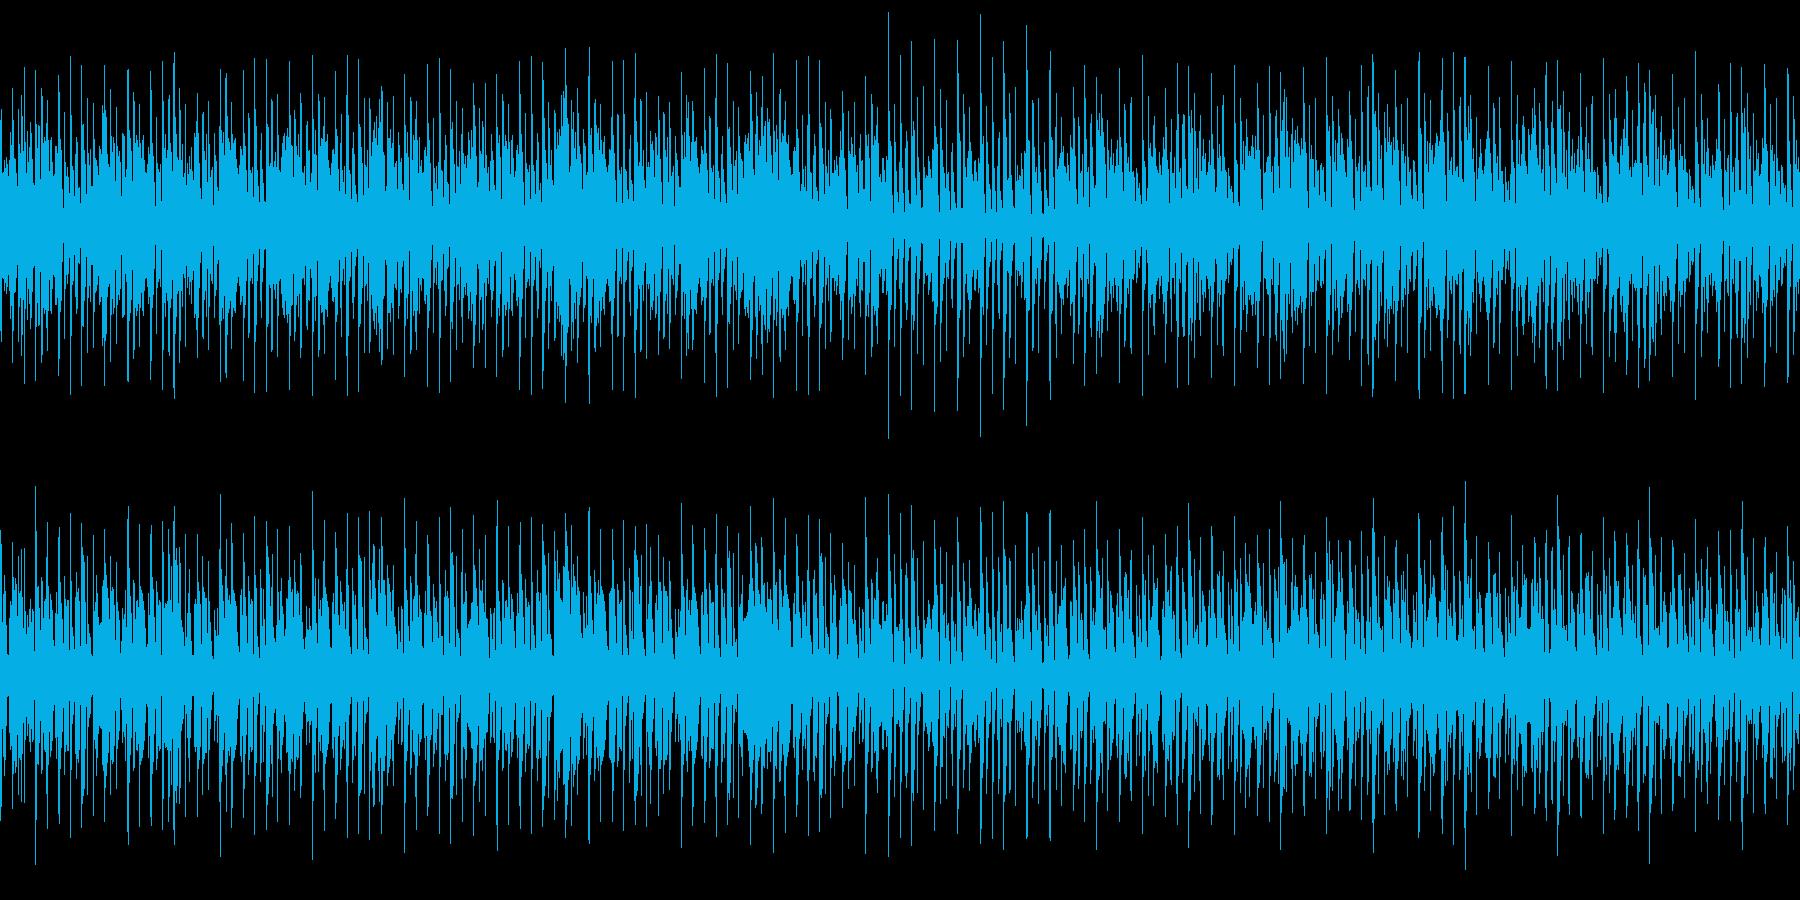 DJライブBGMの再生済みの波形